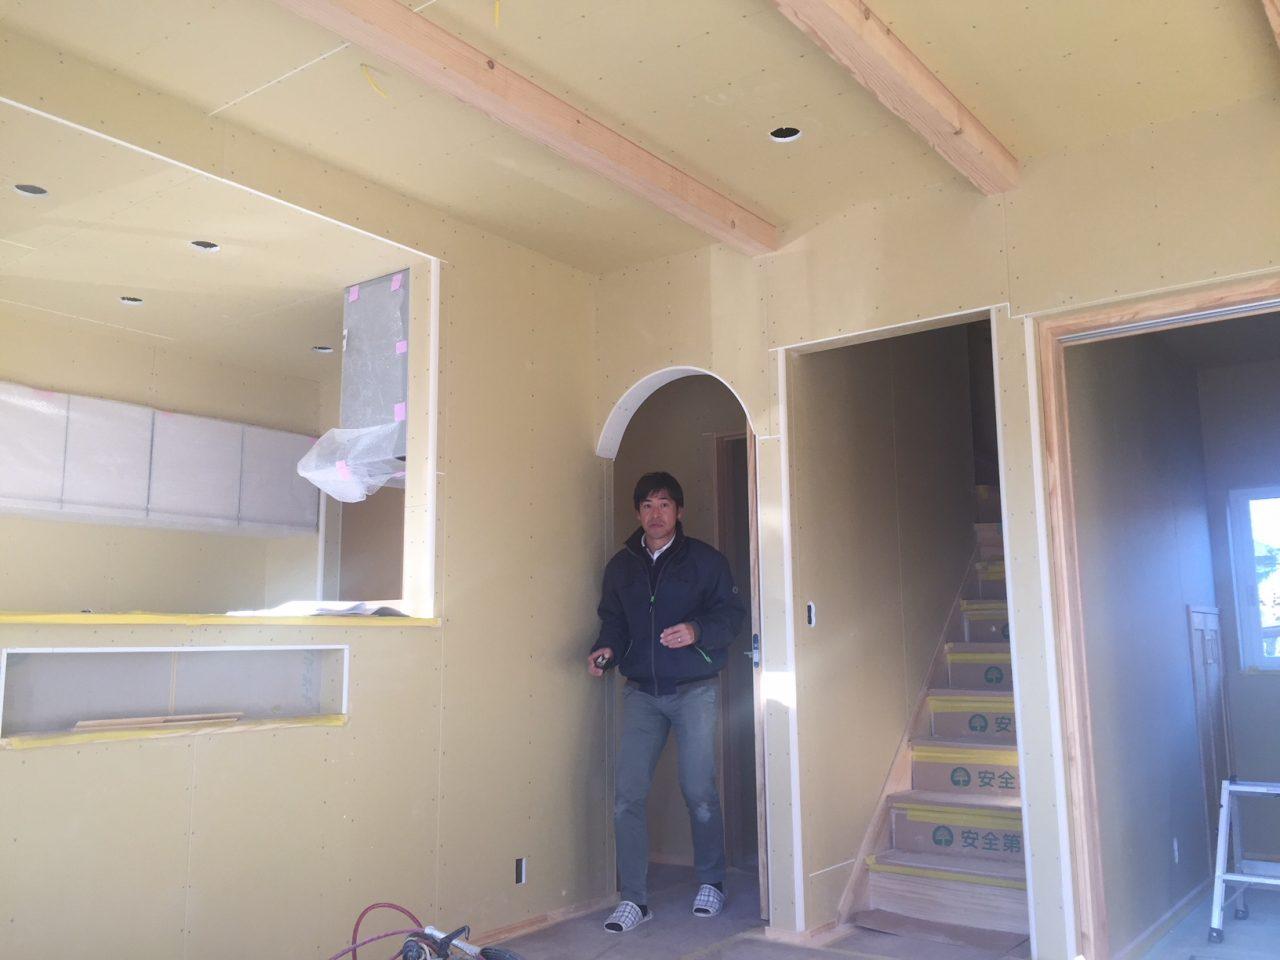 建築現場仕上げ前の室内と現場監督